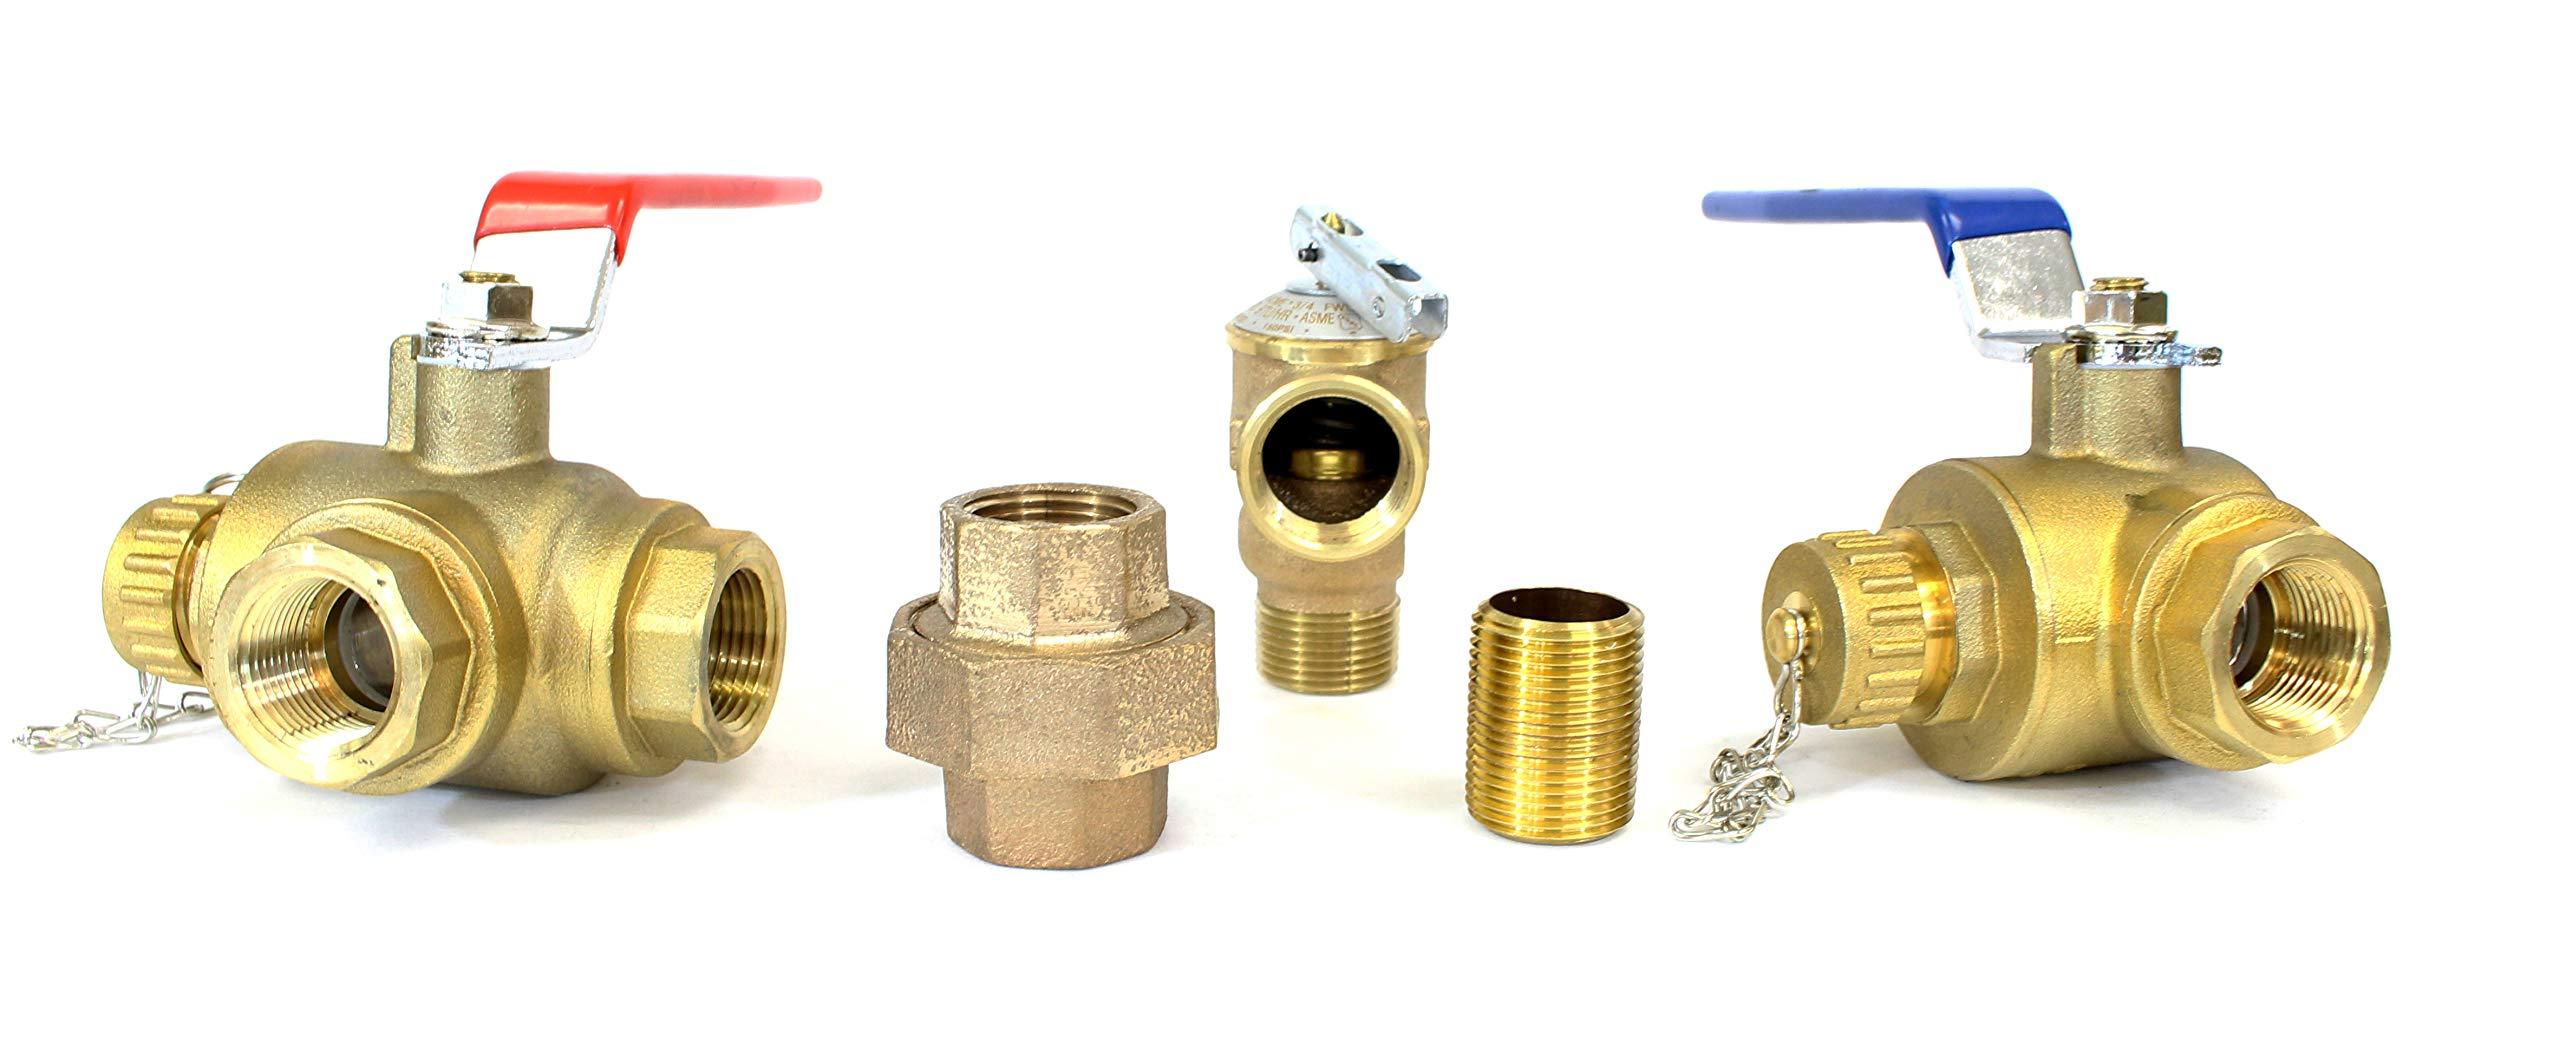 Tankless Water Heater Flush Kit 3/4'' Lead Free Isolation Service Valves